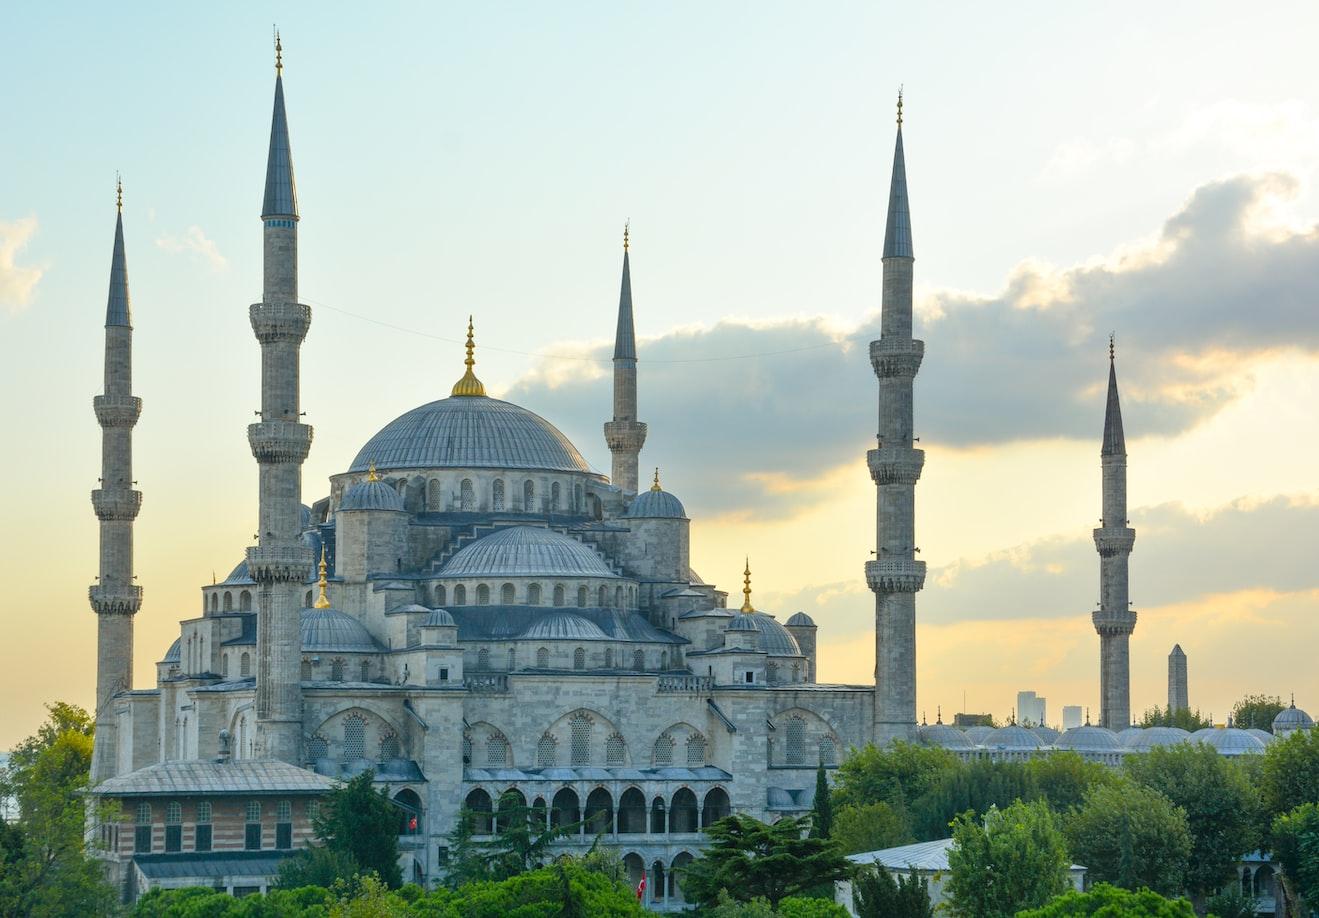 dovolená v teple v turecku